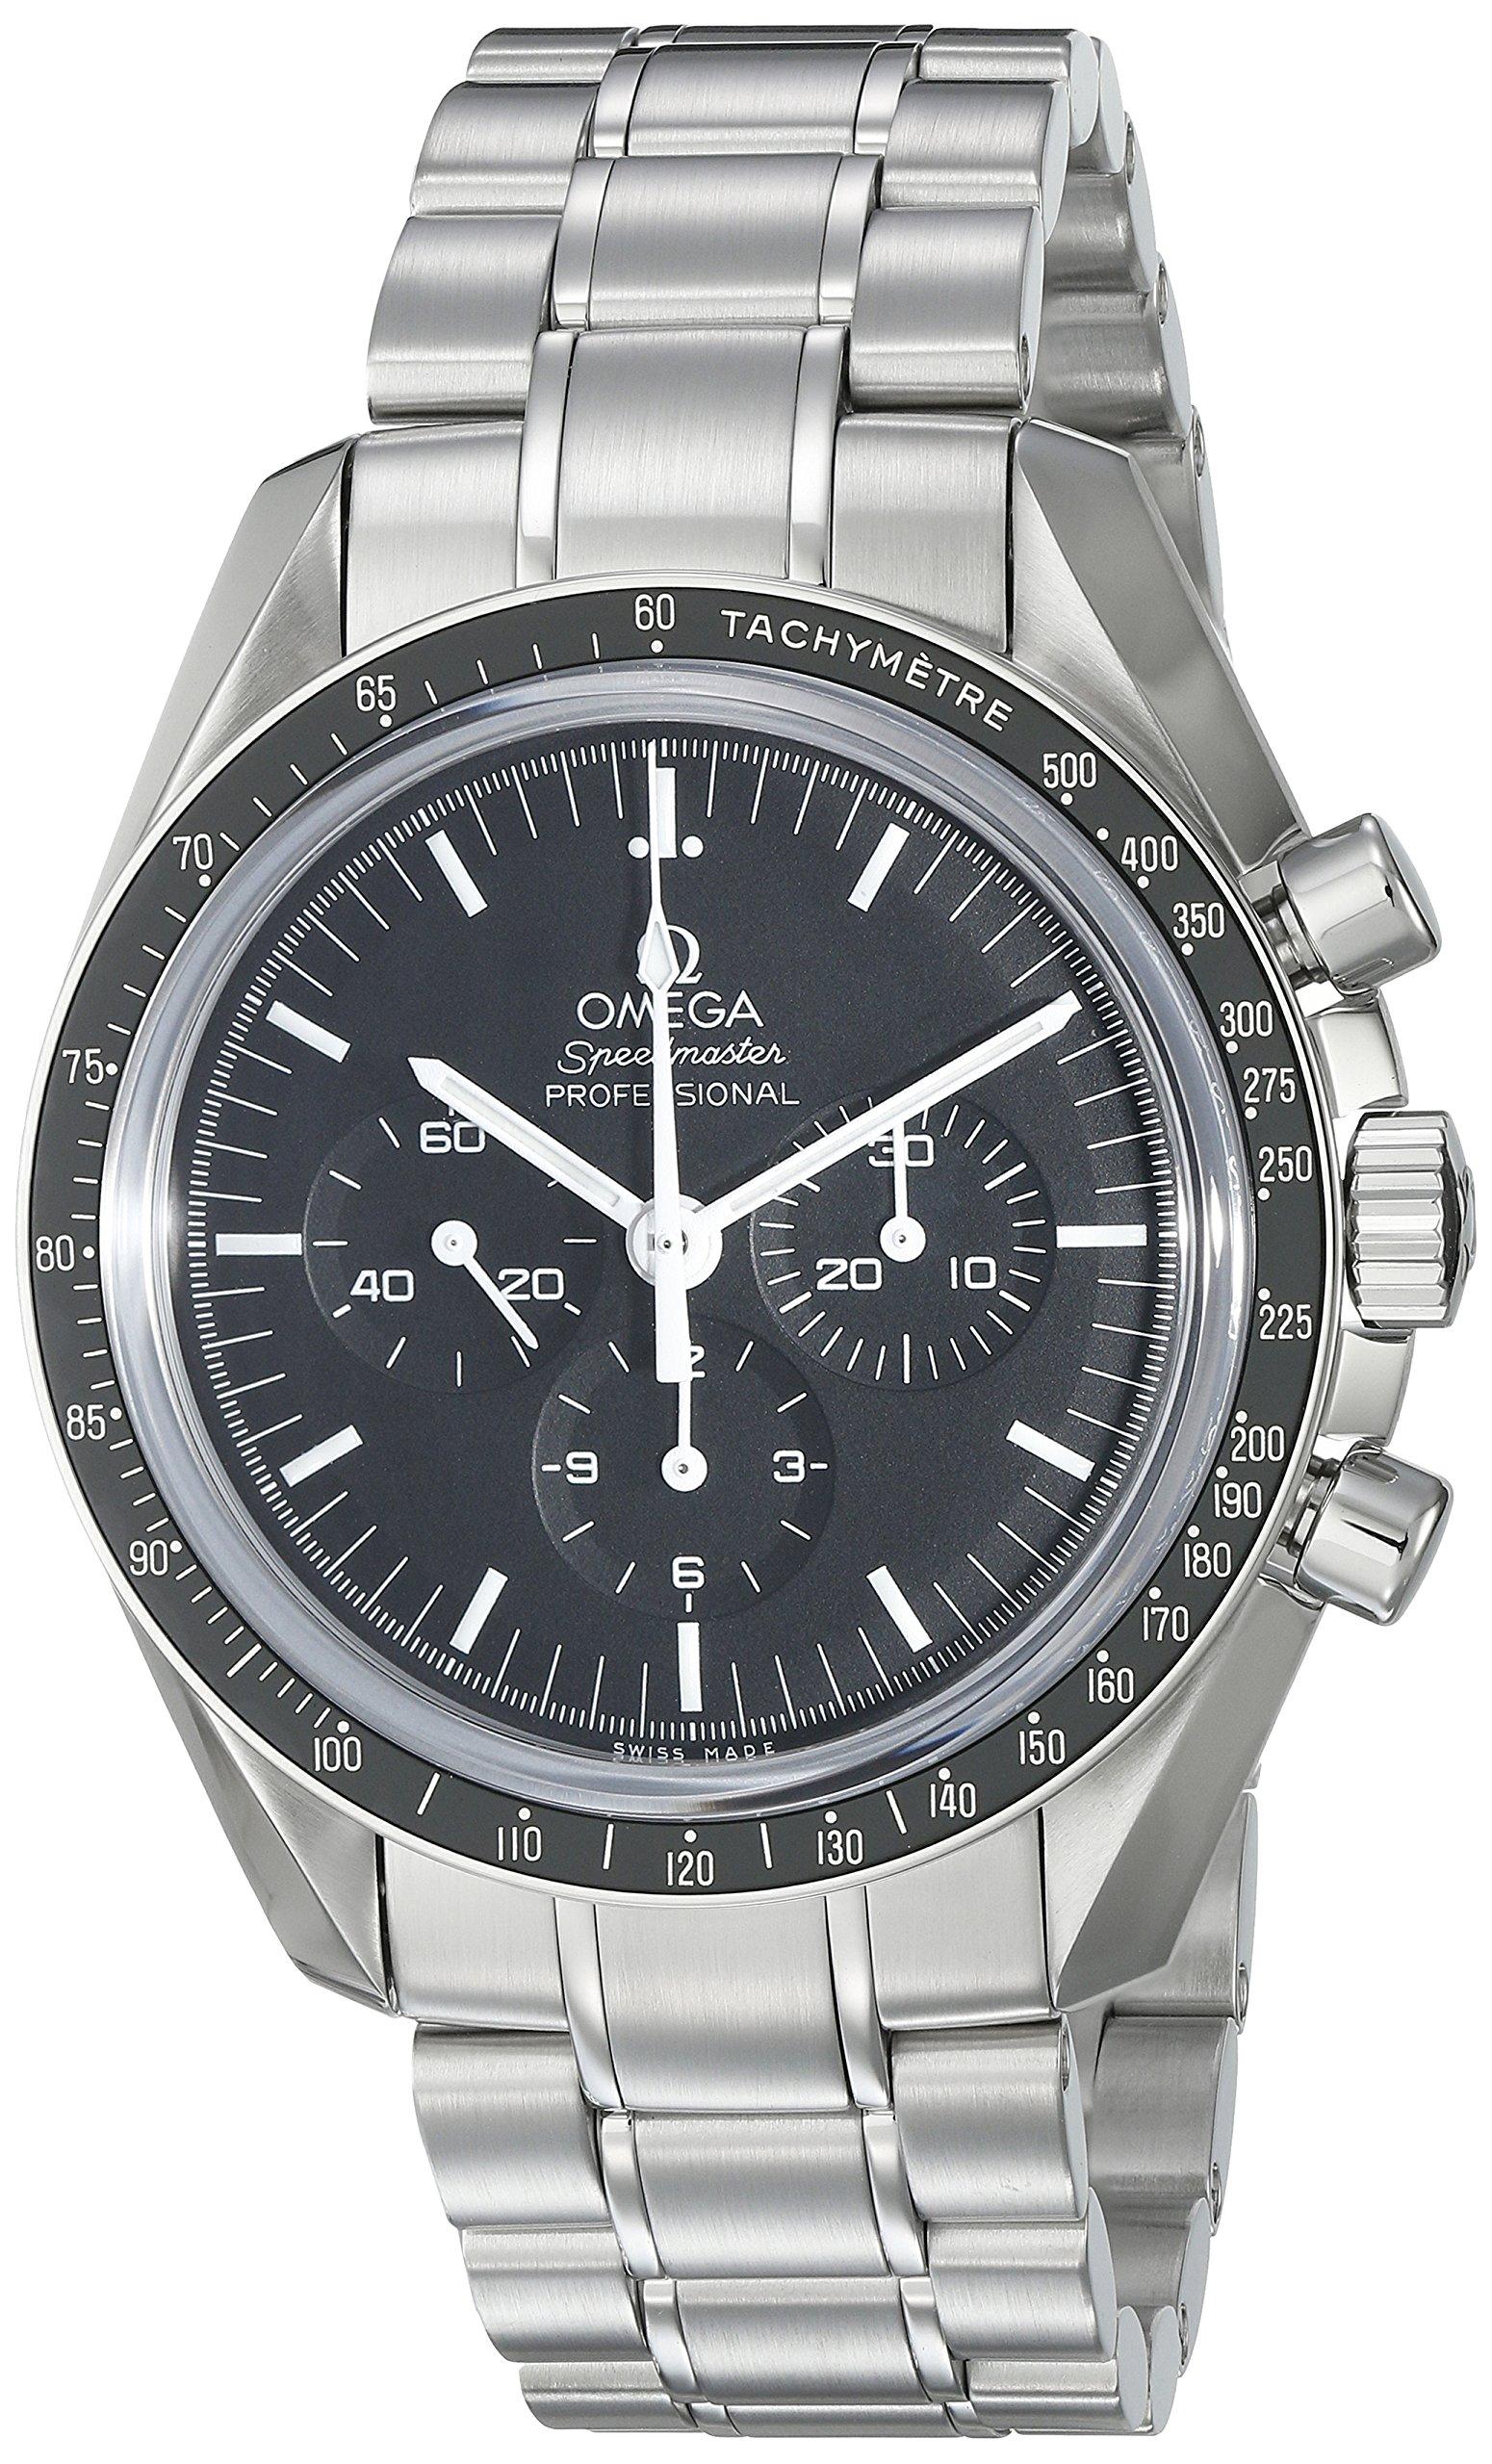 "Omega Speedmaster Professional ""Moonwatch"" - Reloj (Reloj de Pulsera, Acero Inoxidable, Acero Inoxidable, Acero Inoxidable, Acero Inoxidable, Hesalita) 1"